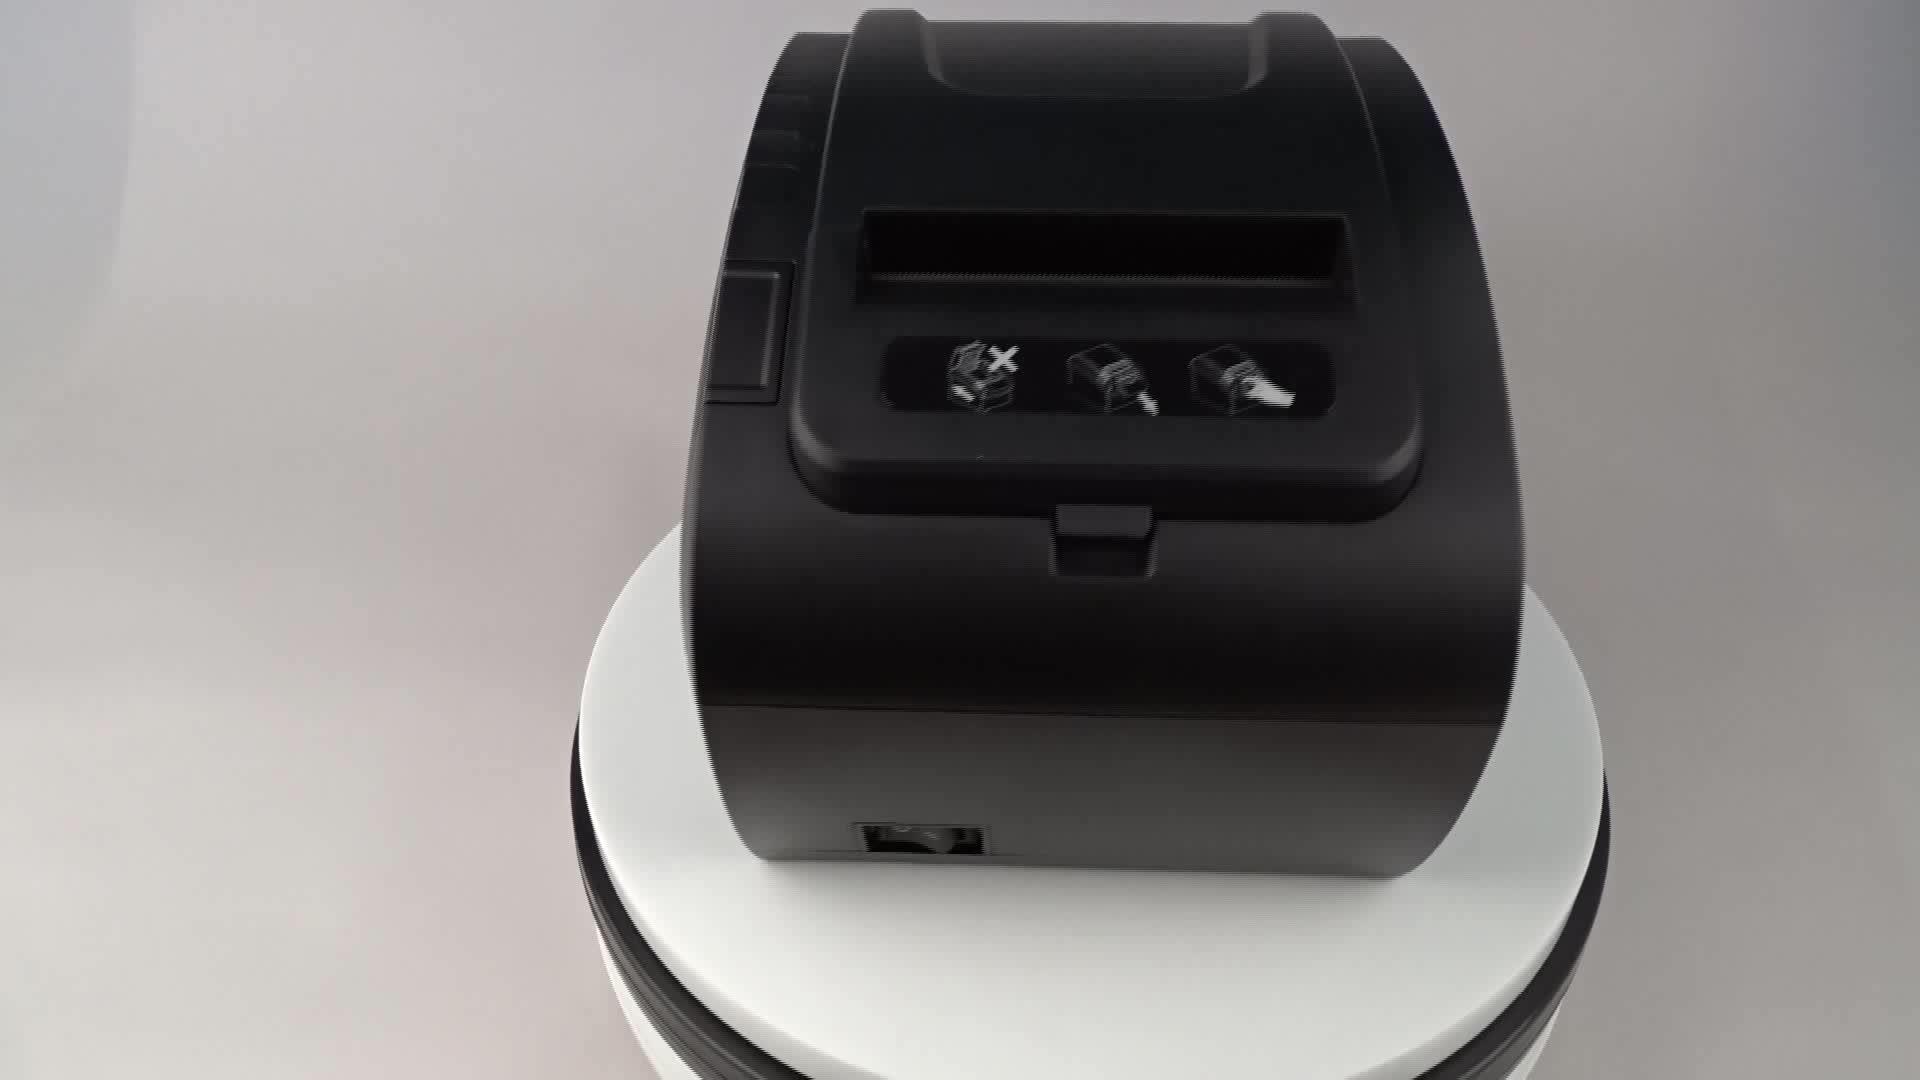 2019 New Hot USB 80mm thermal printer pos receipt printer